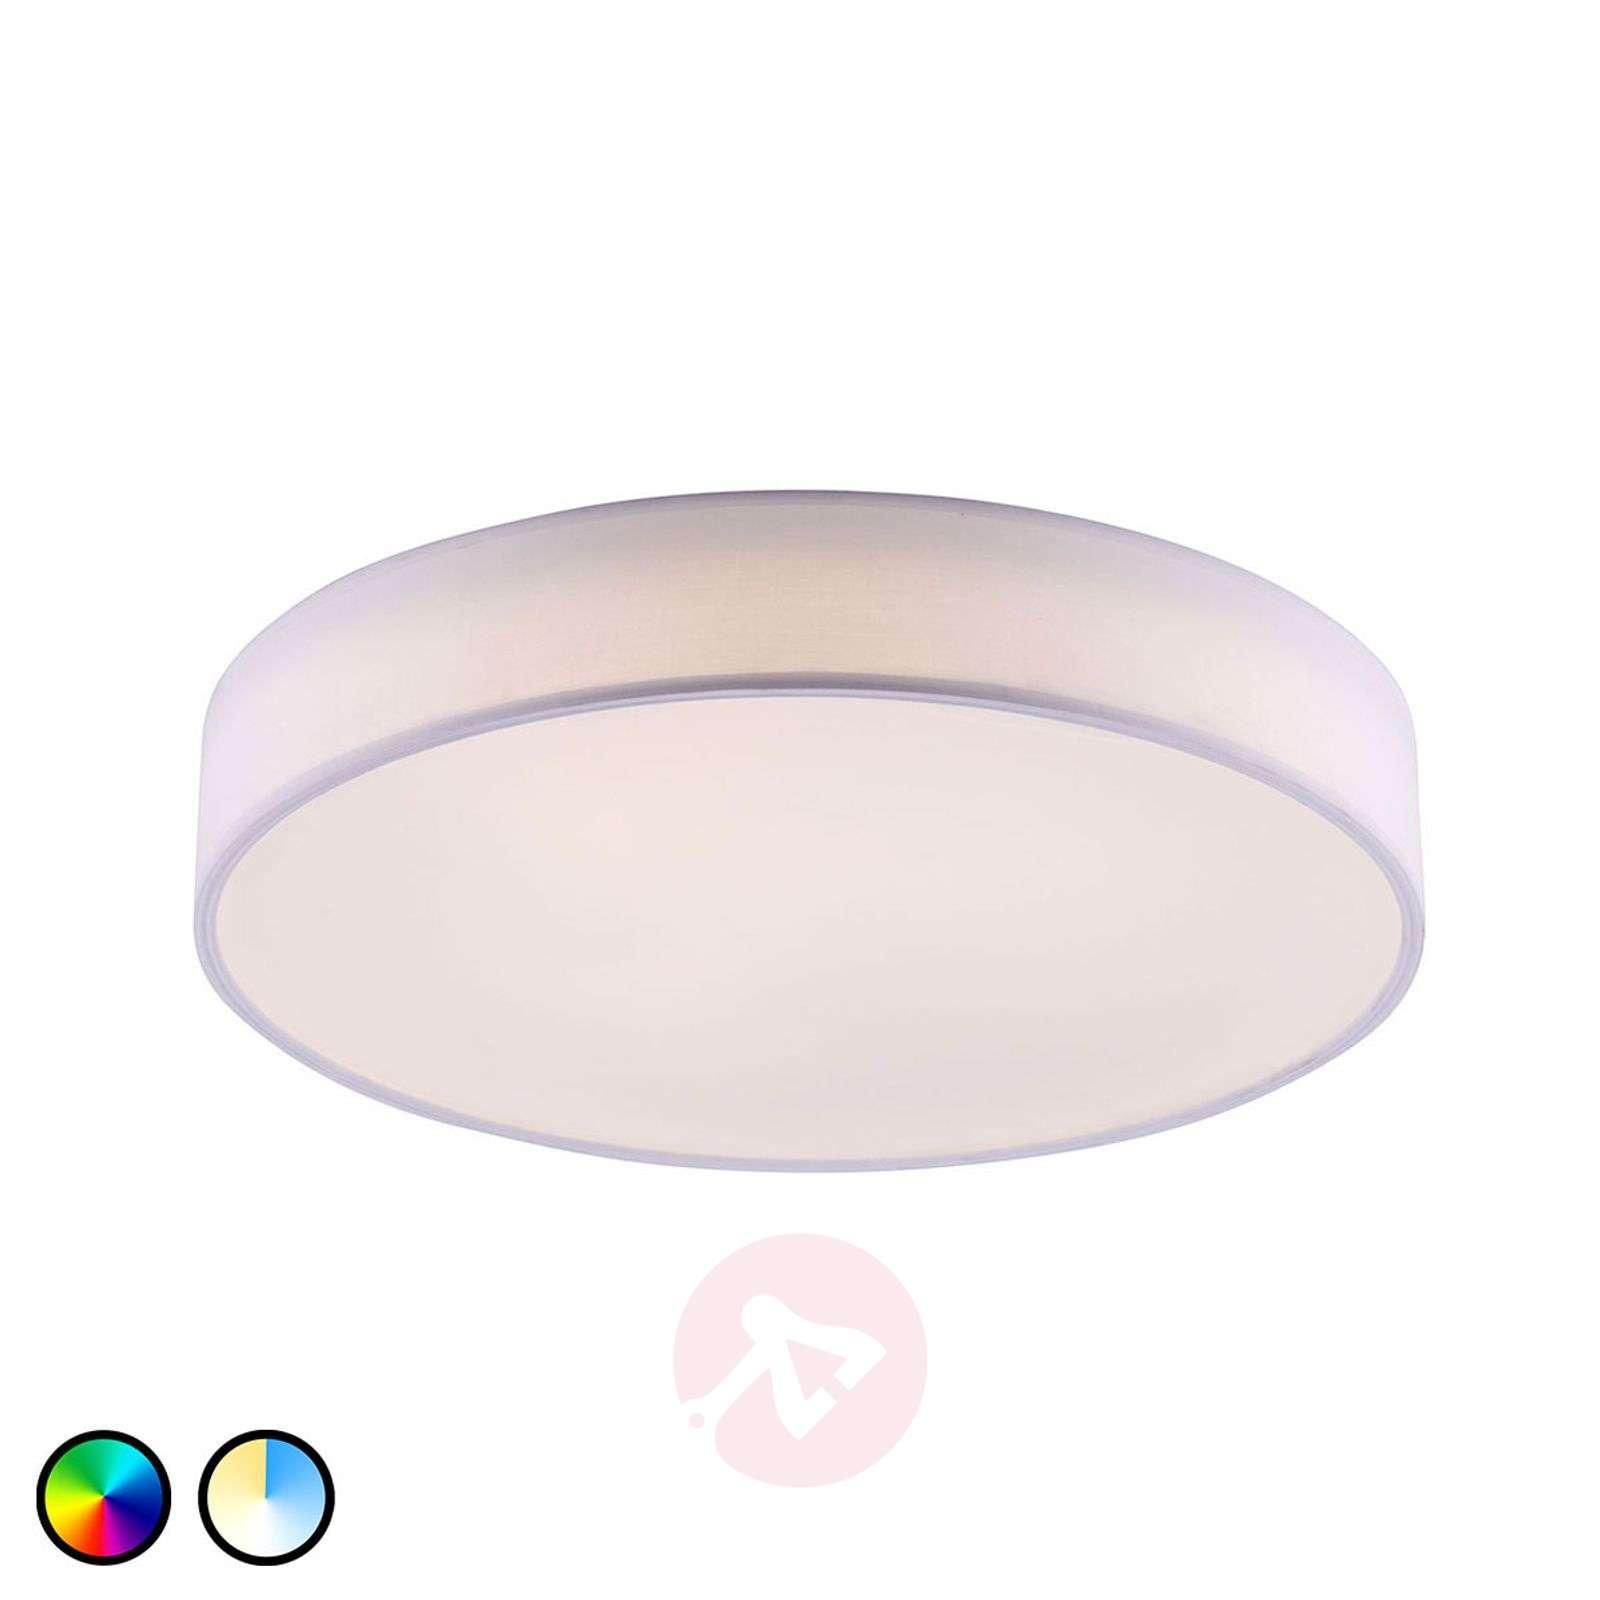 Trio WiZ Diamo LED-kattovalaisin RGBW-9005615X-01